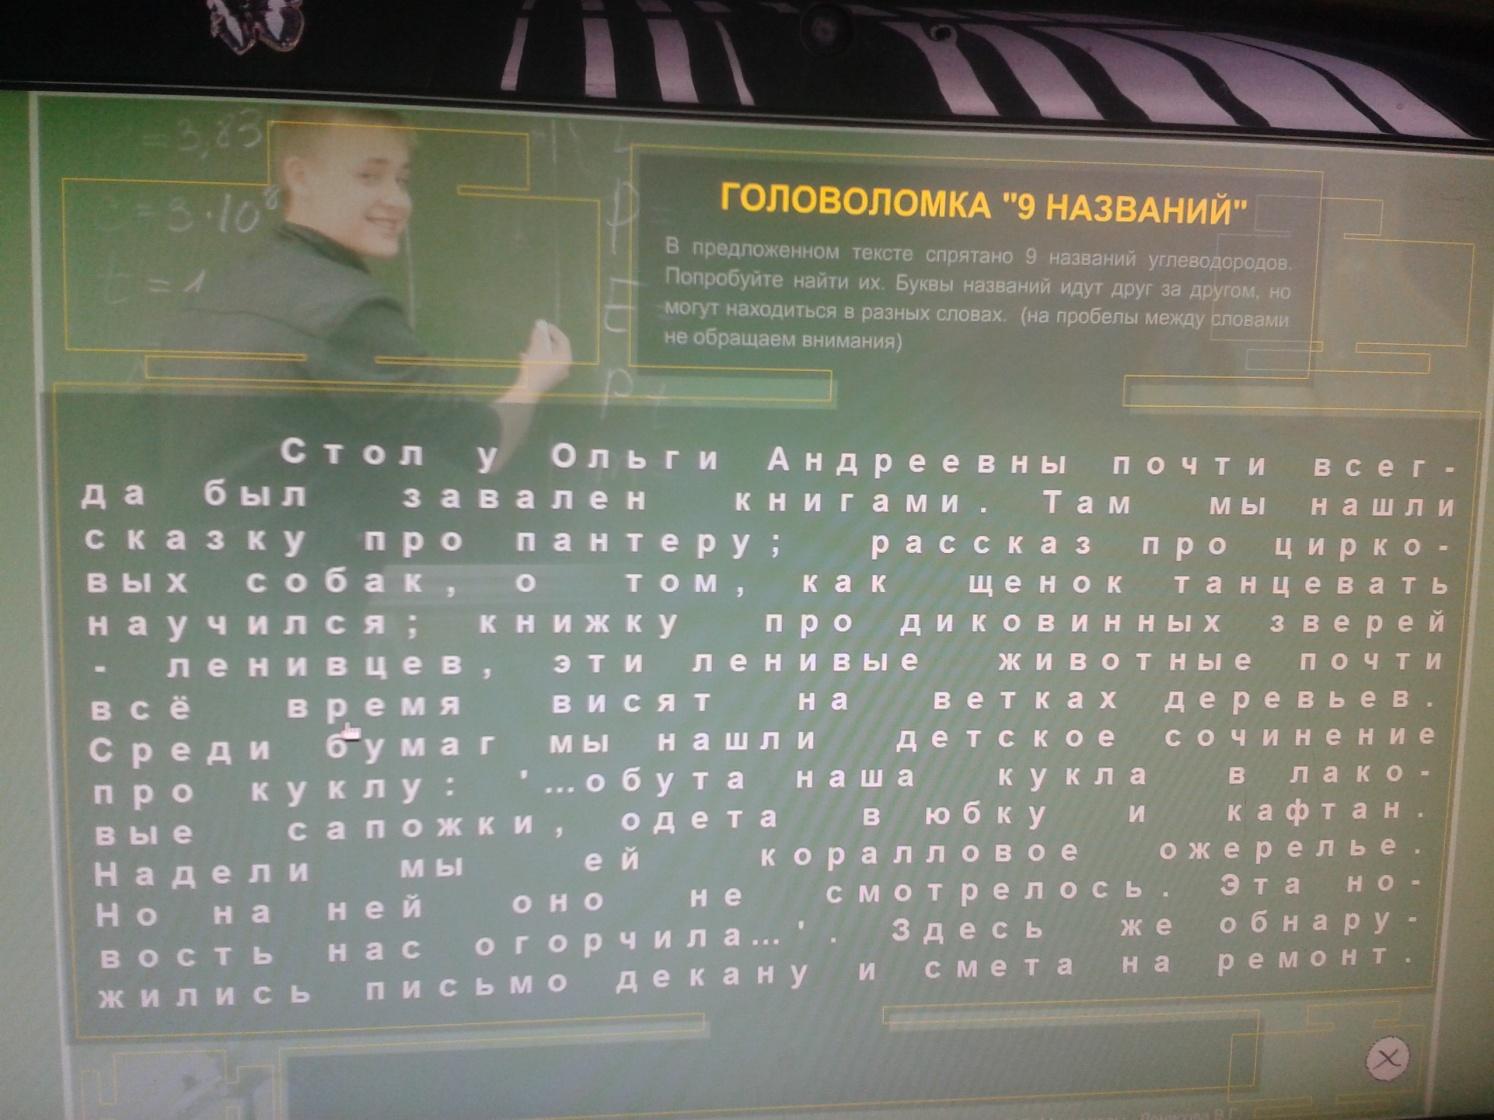 C:\Users\Учитель химии\Pictures\2016-01-13\246.jpg